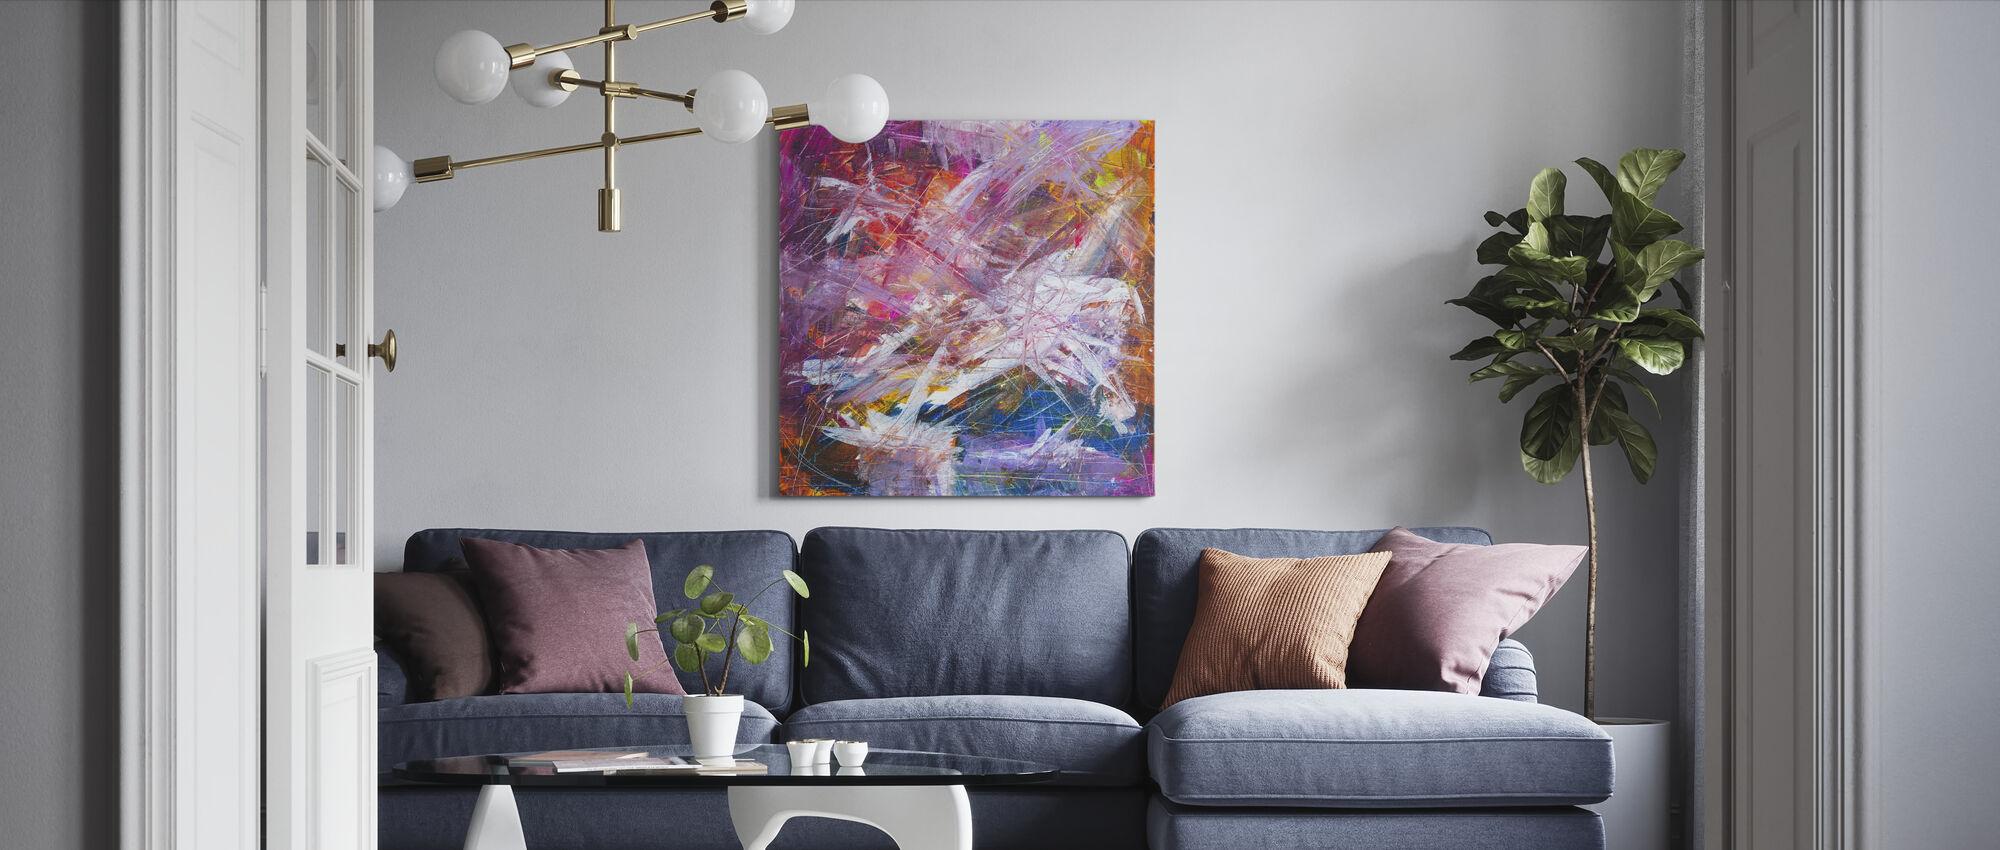 Abstrakt maleri - Lerretsbilde - Stue